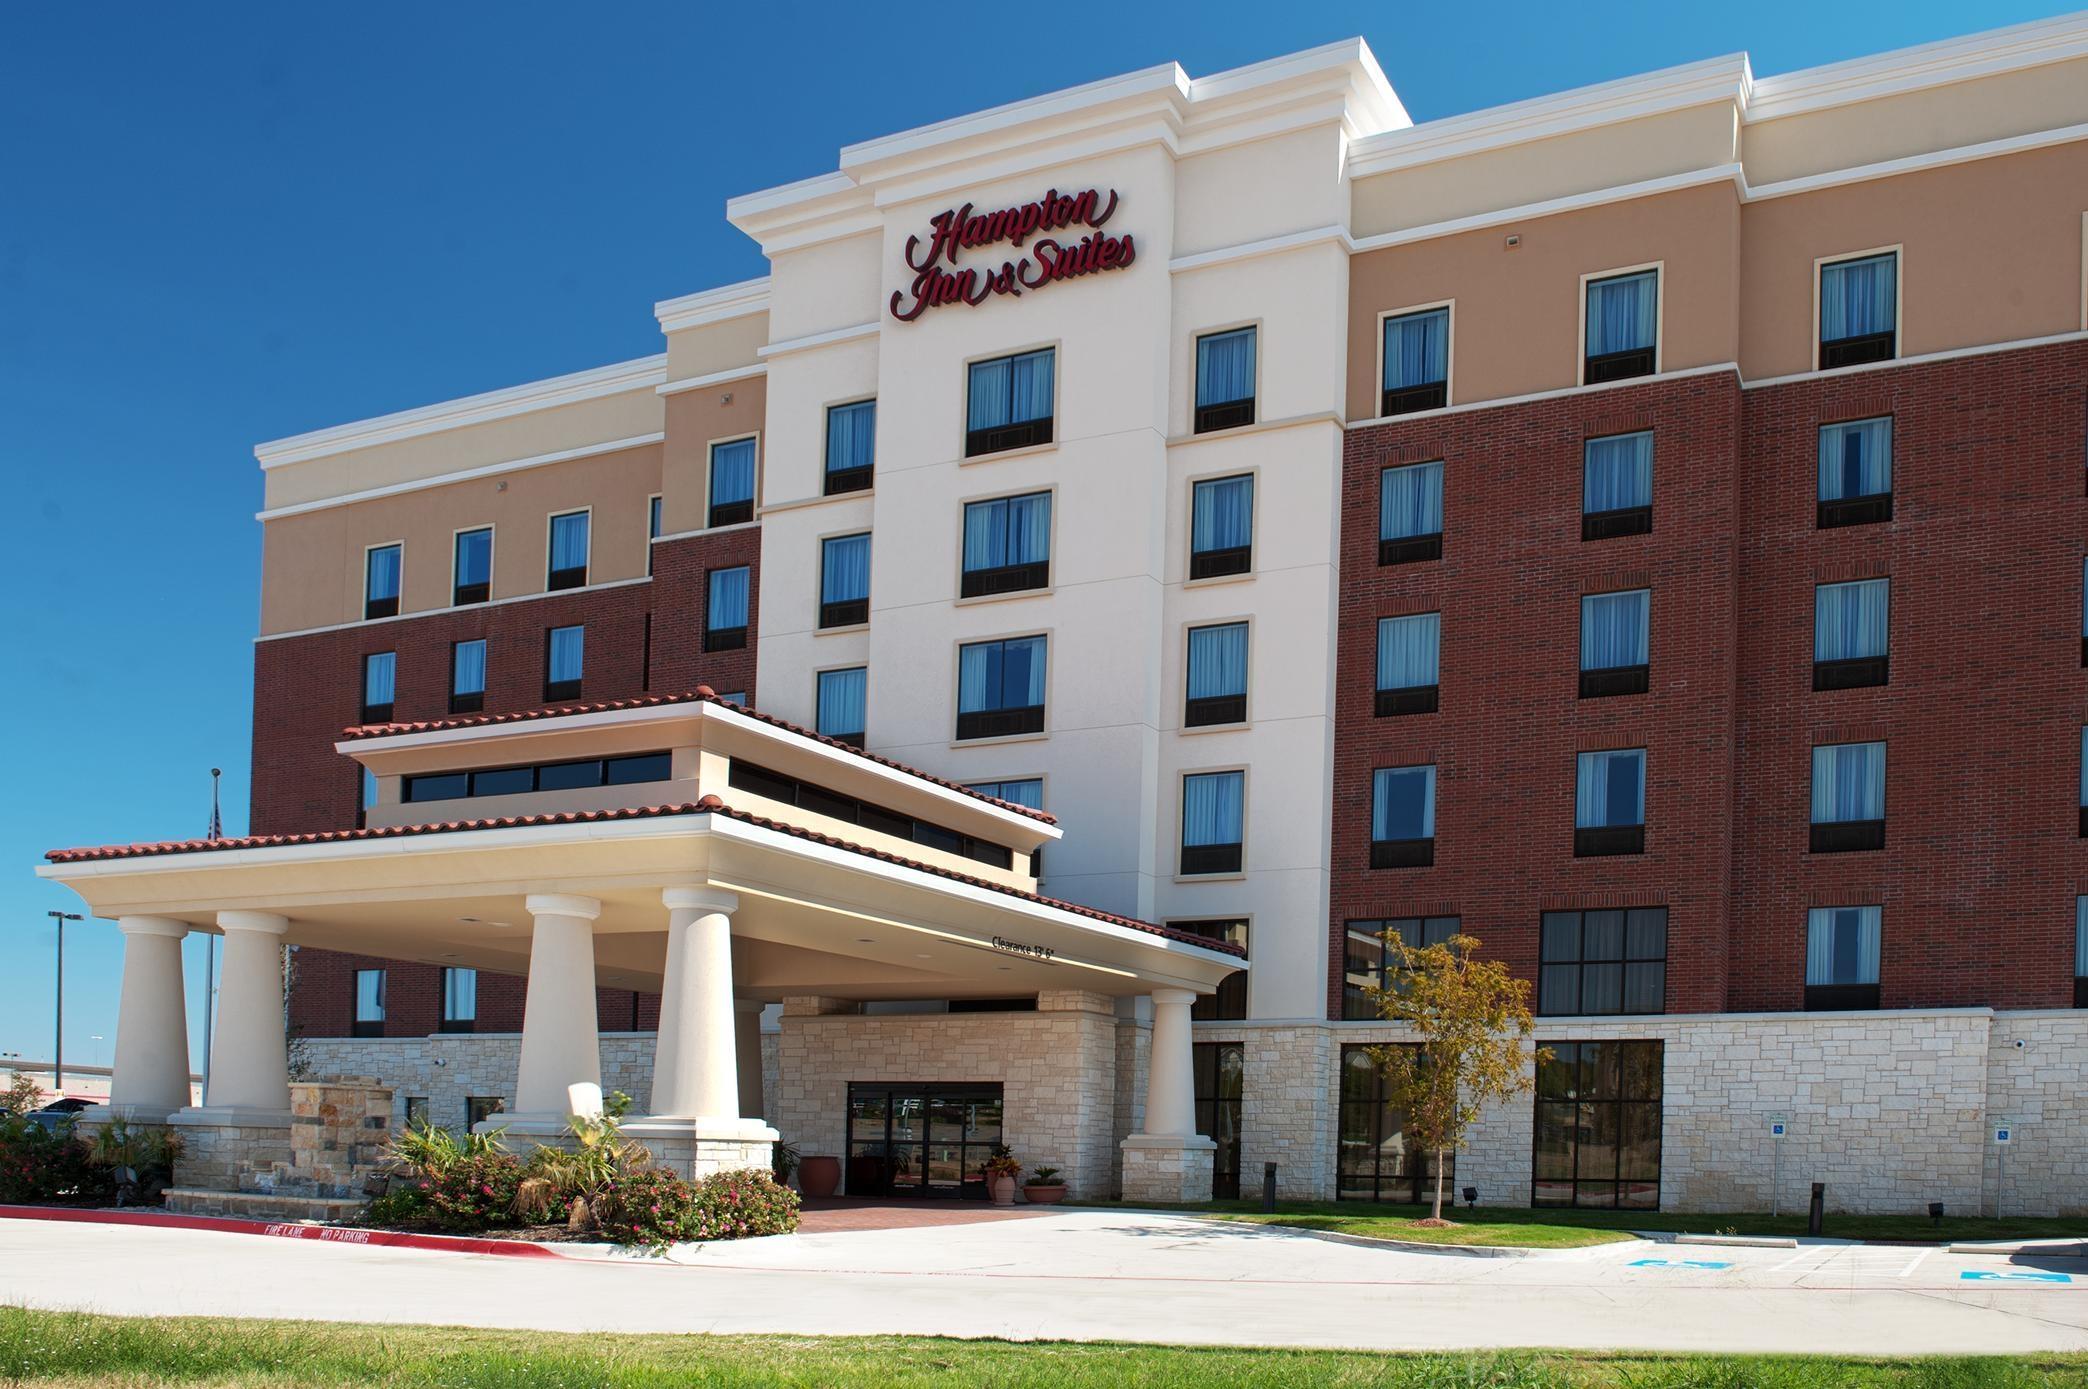 Hampton Inn & Suites Dallas/Lewisville-Vista Ridge Mall, TX image 3